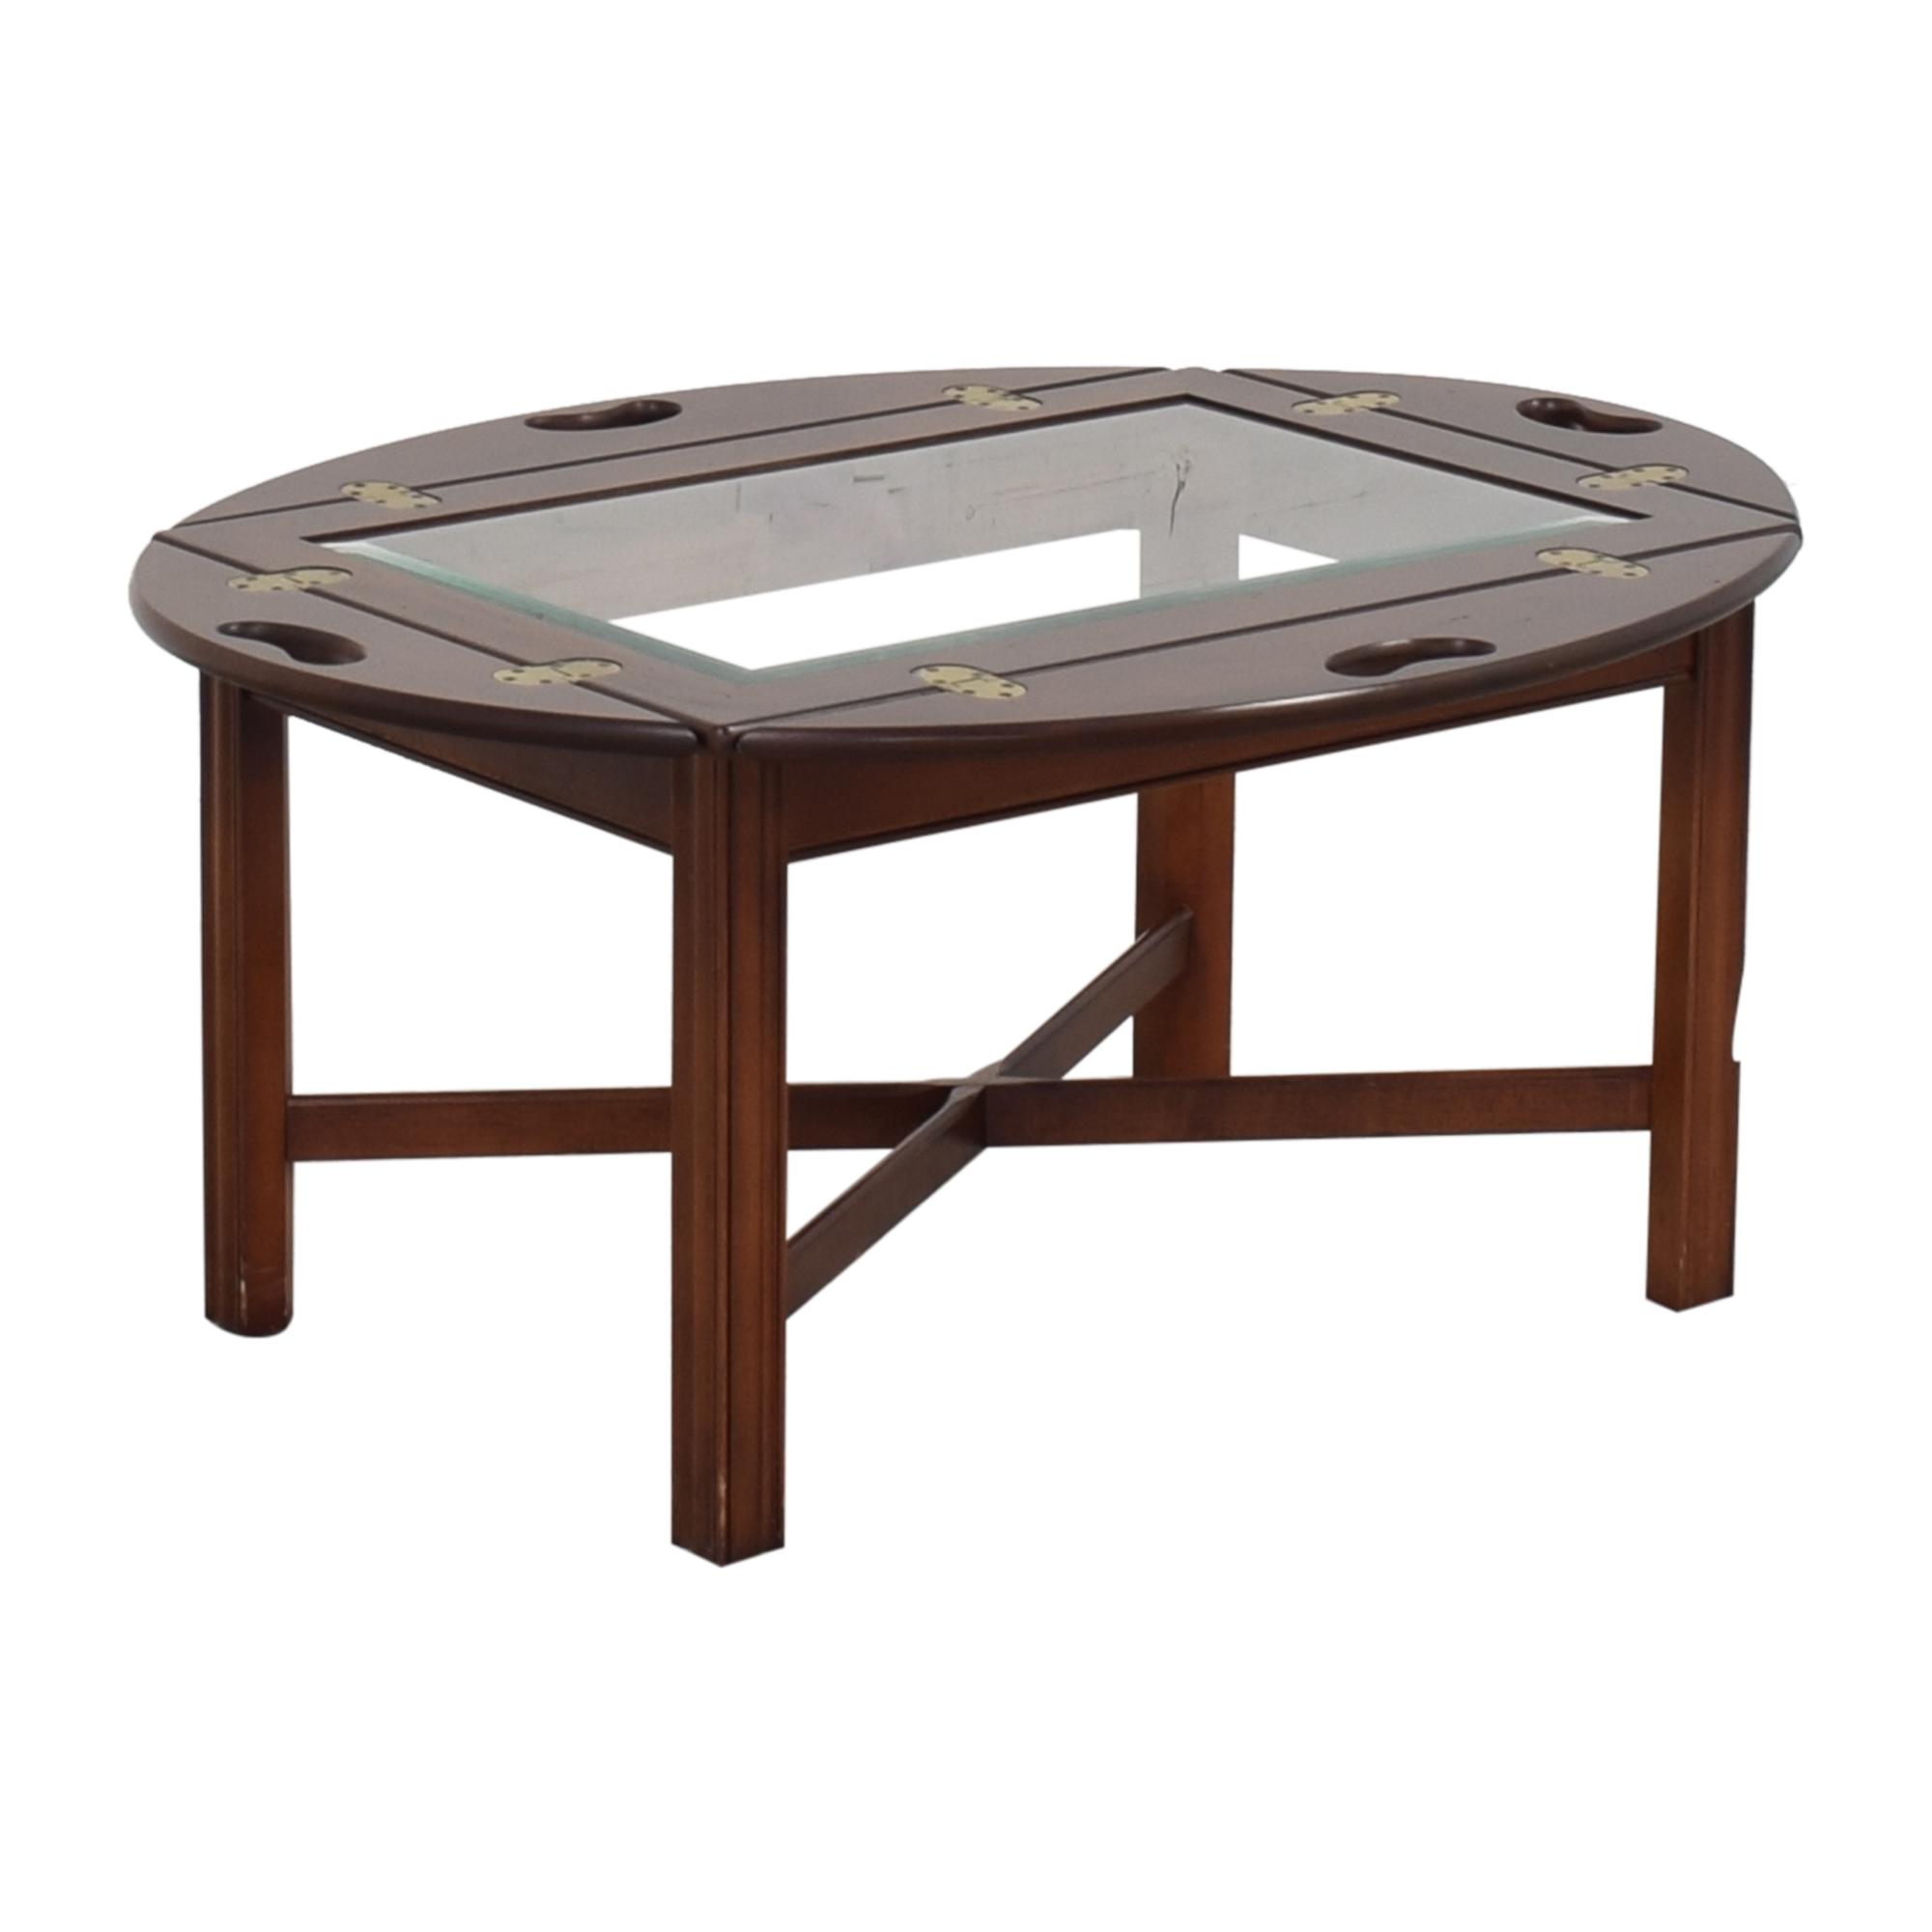 Huffman Koos Huffman Koos Fold Down Coffee Table brown